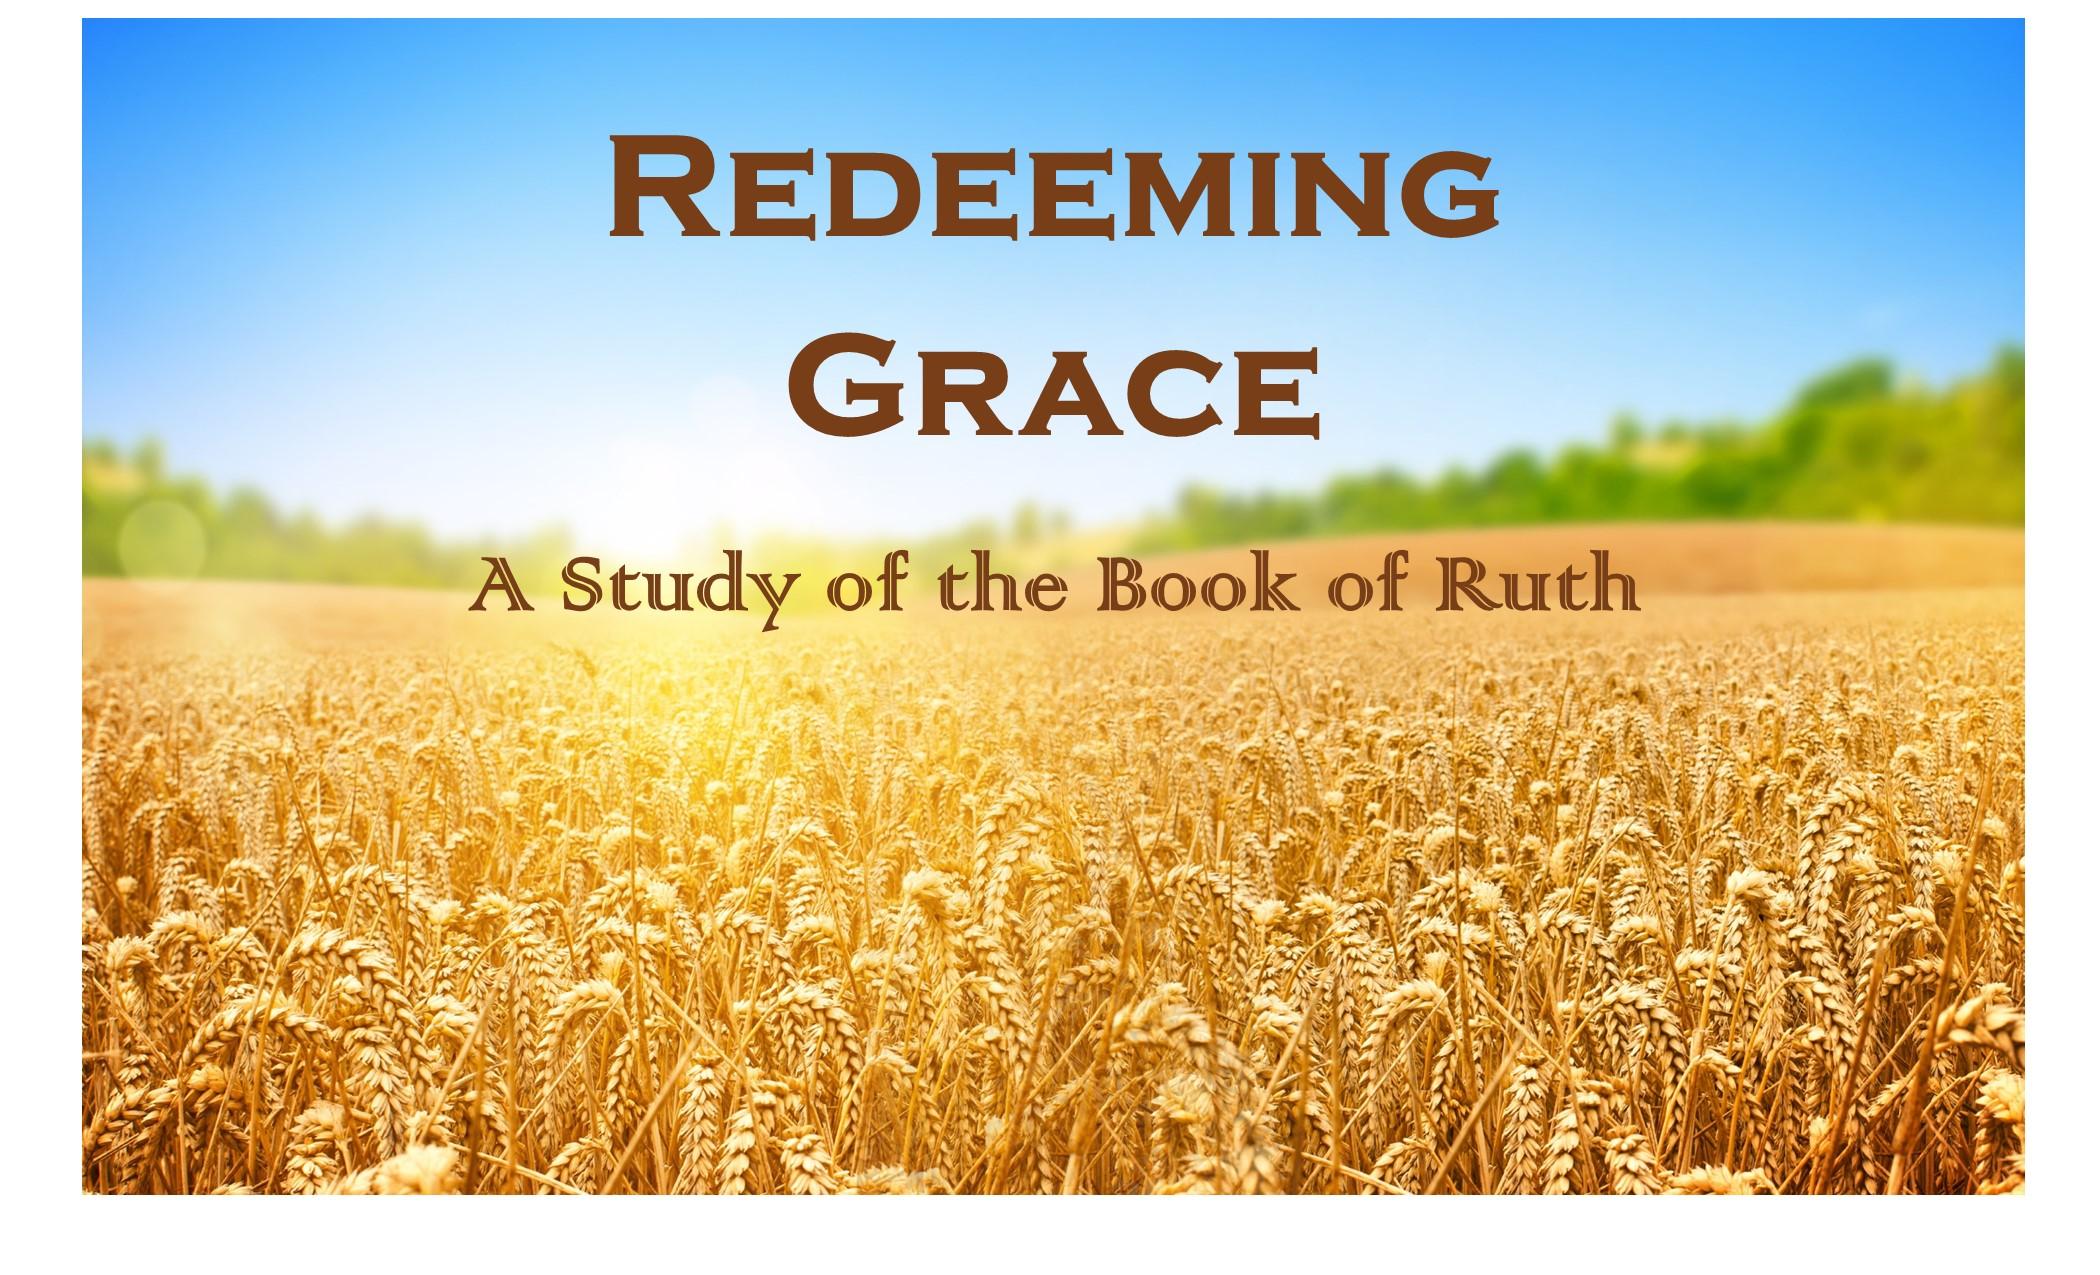 Redeeming Grace: Redeemed and Wedded